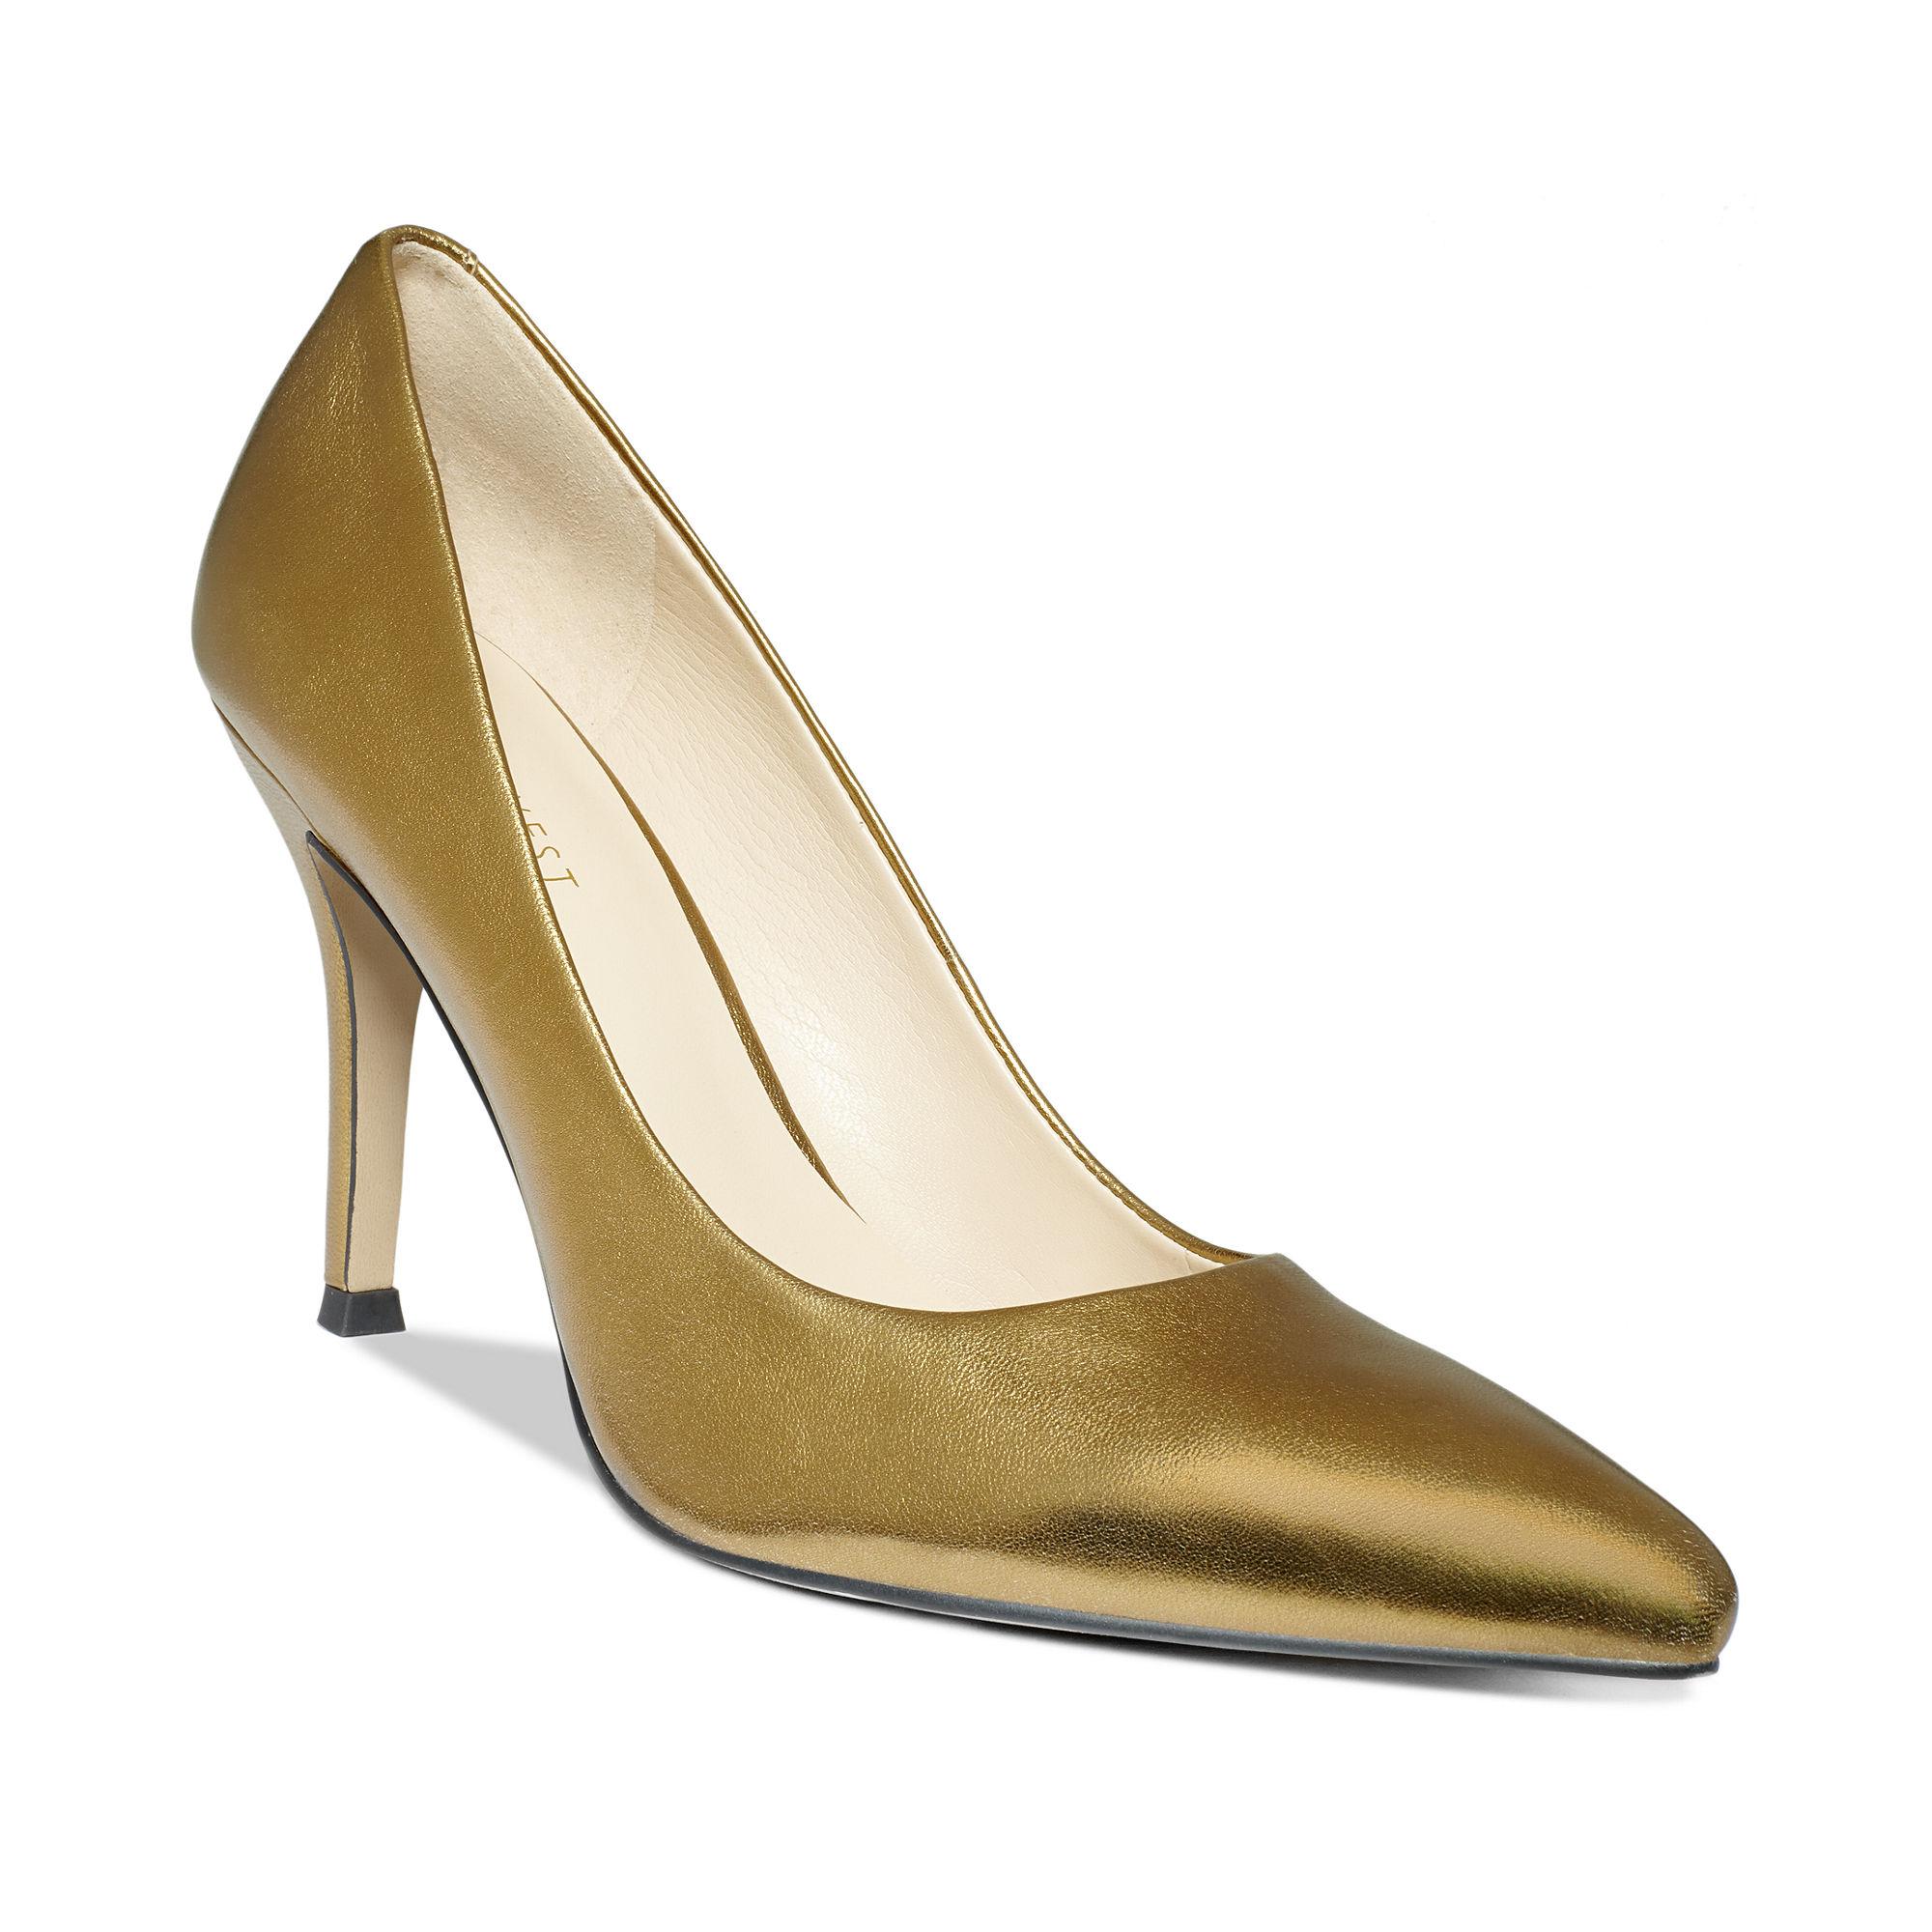 Nine West Flax Heel Shoes